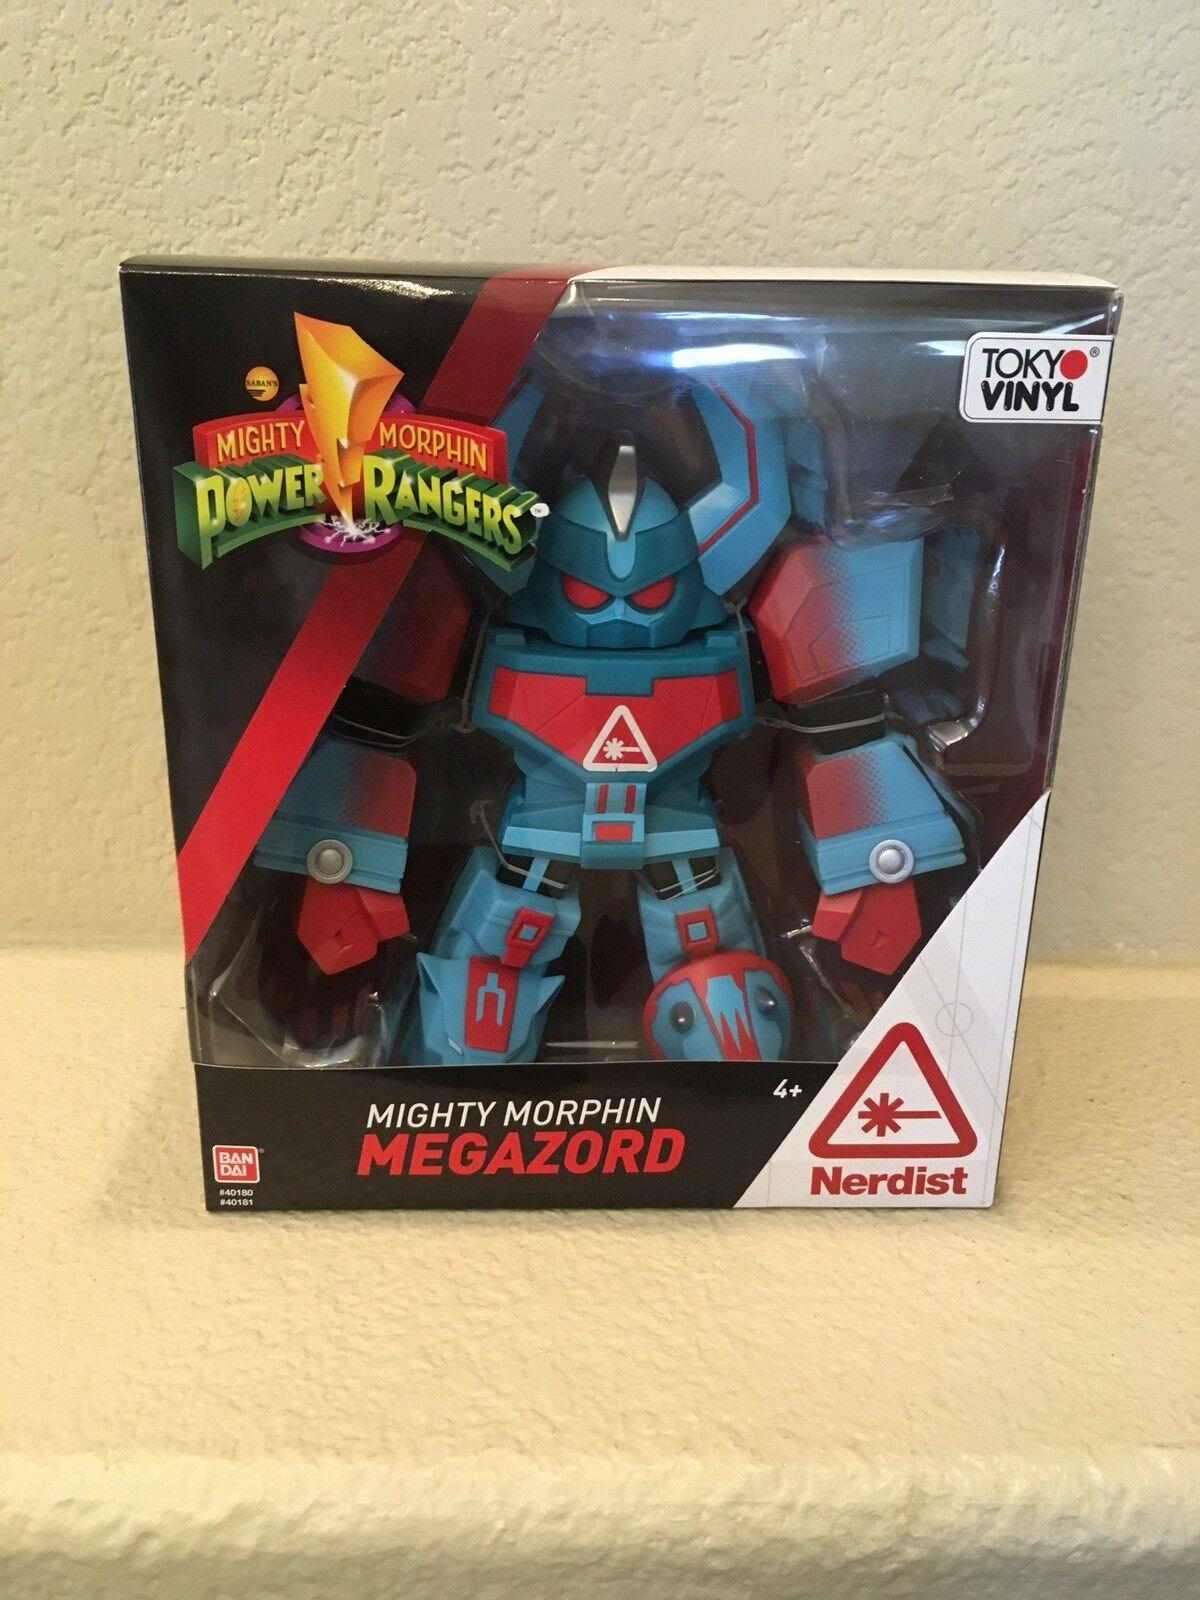 Nerdist Limited Edition Mighty Morphin Power Rangers Dino Megazord Tokyo Vinyl